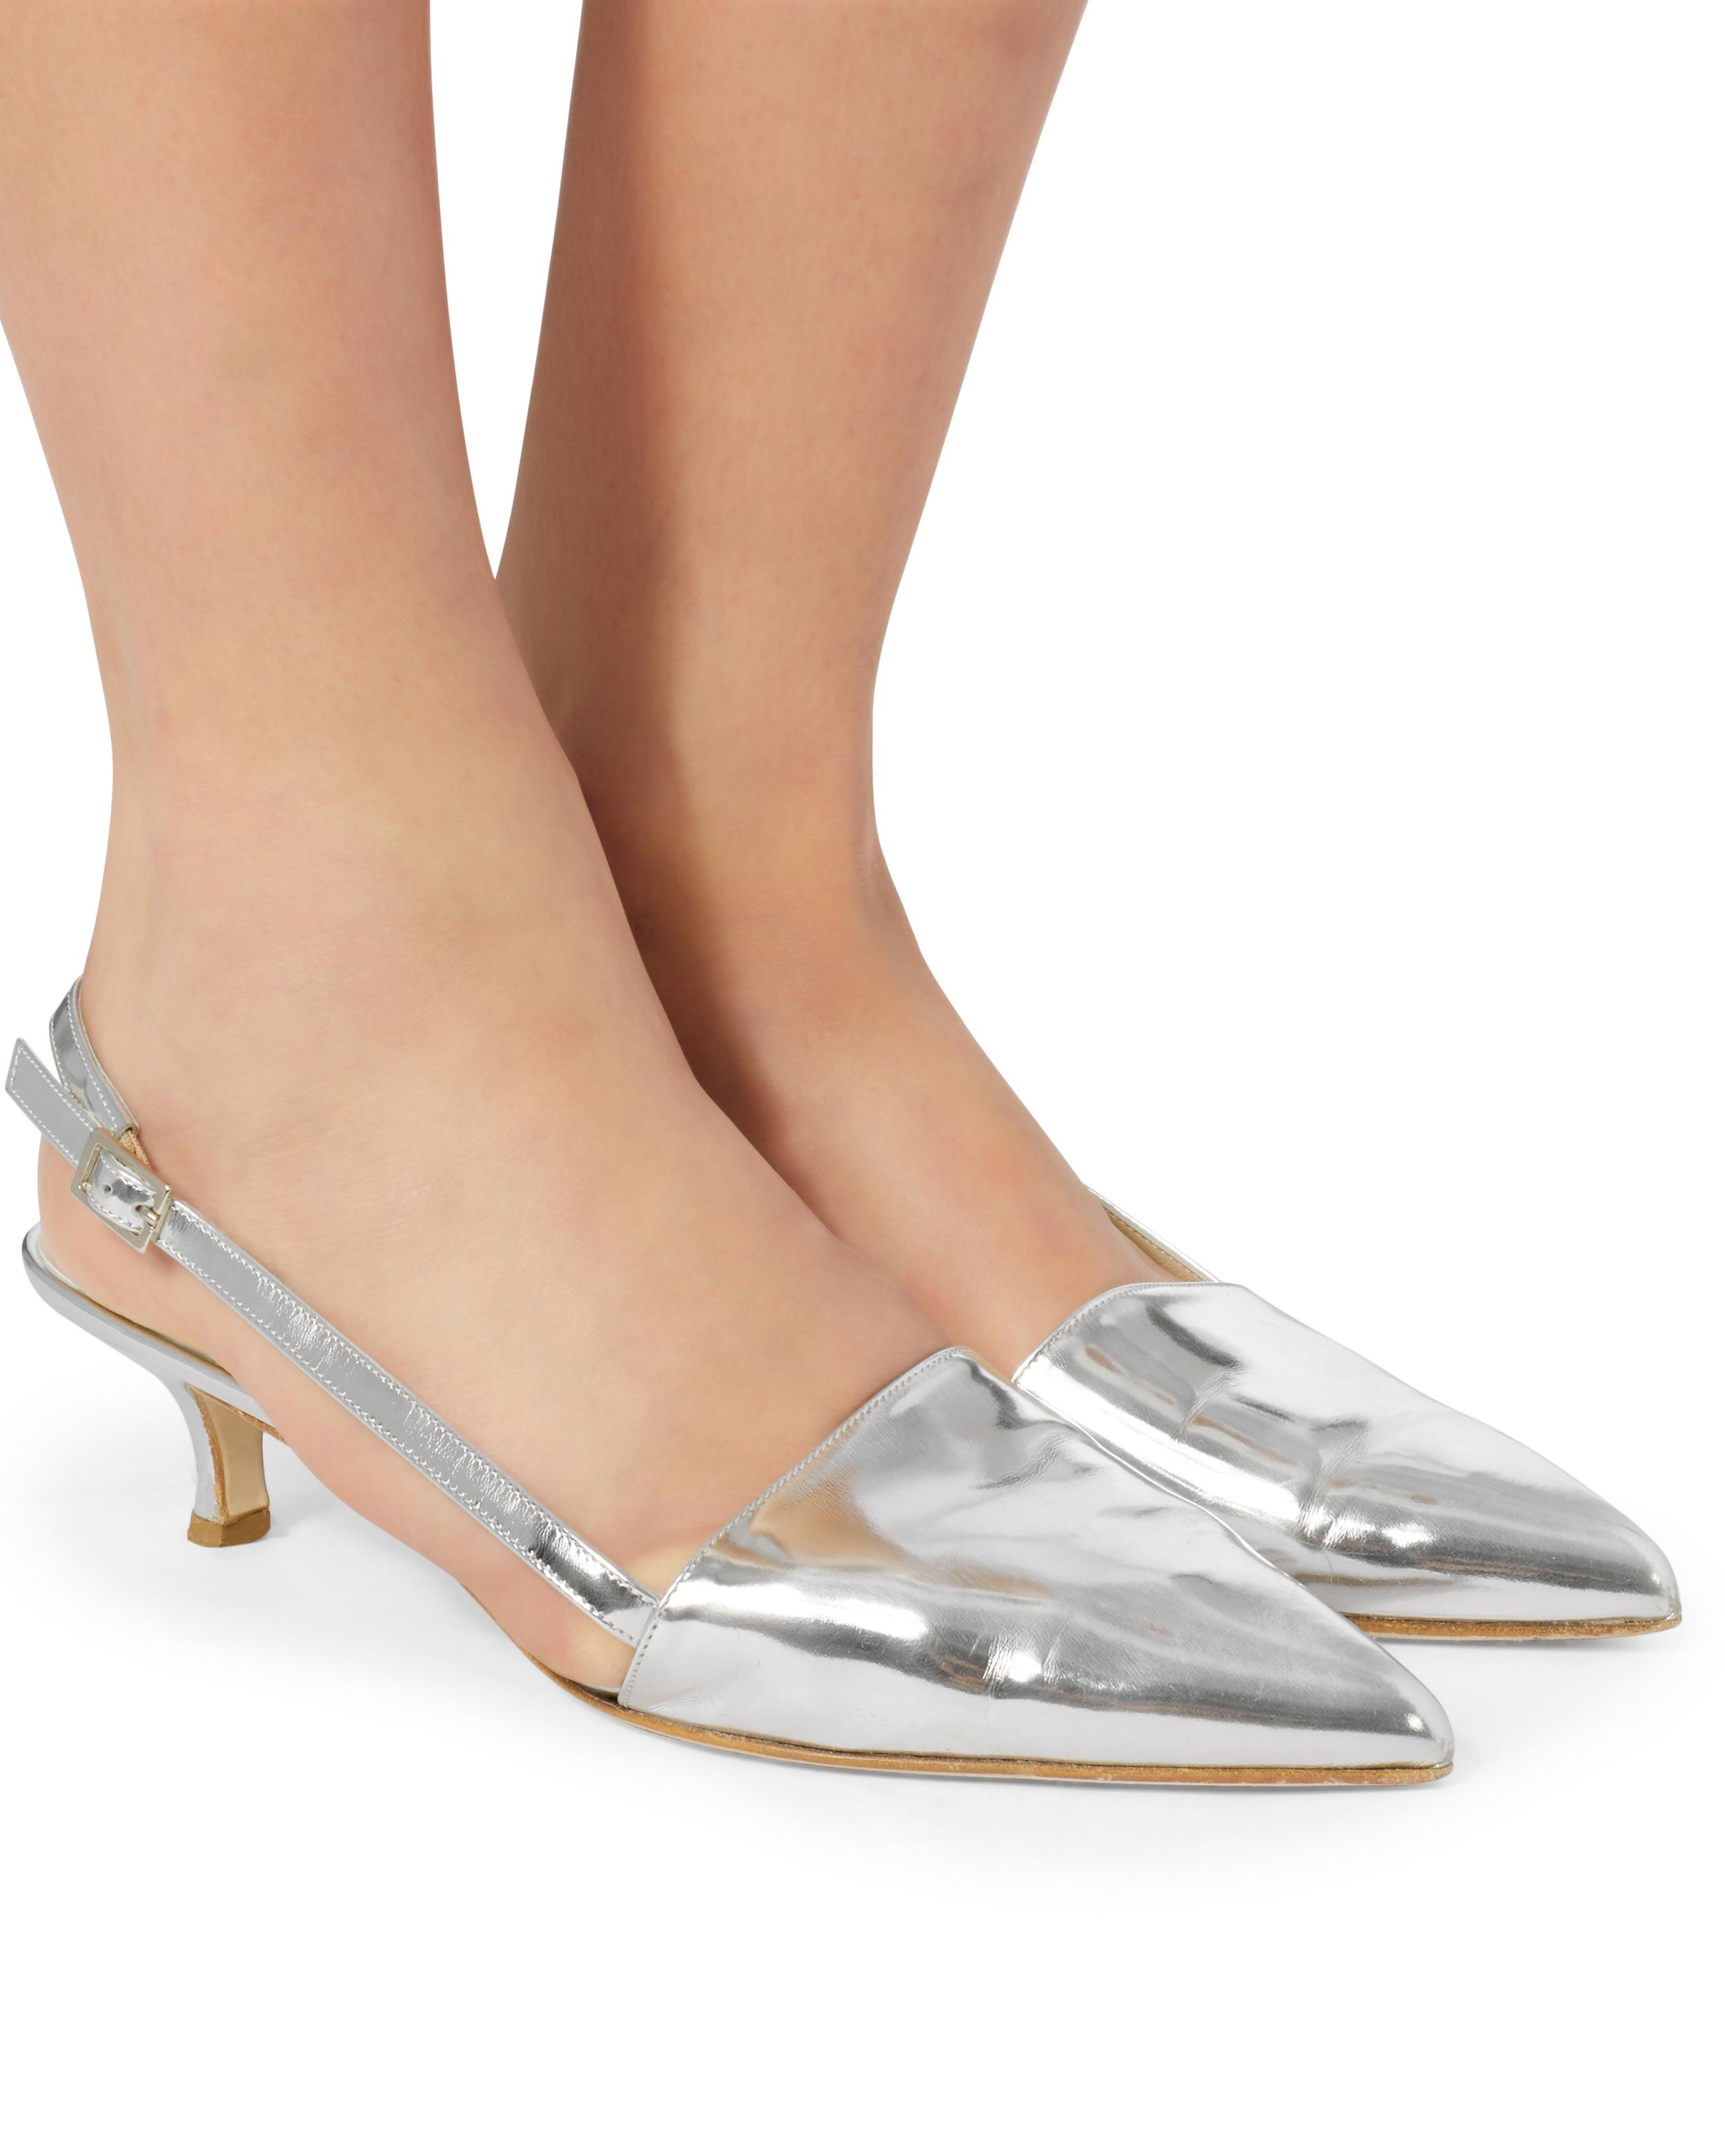 a272e8a17ad Lyst - Tibi Simon Slingback Kitten Heels in Metallic